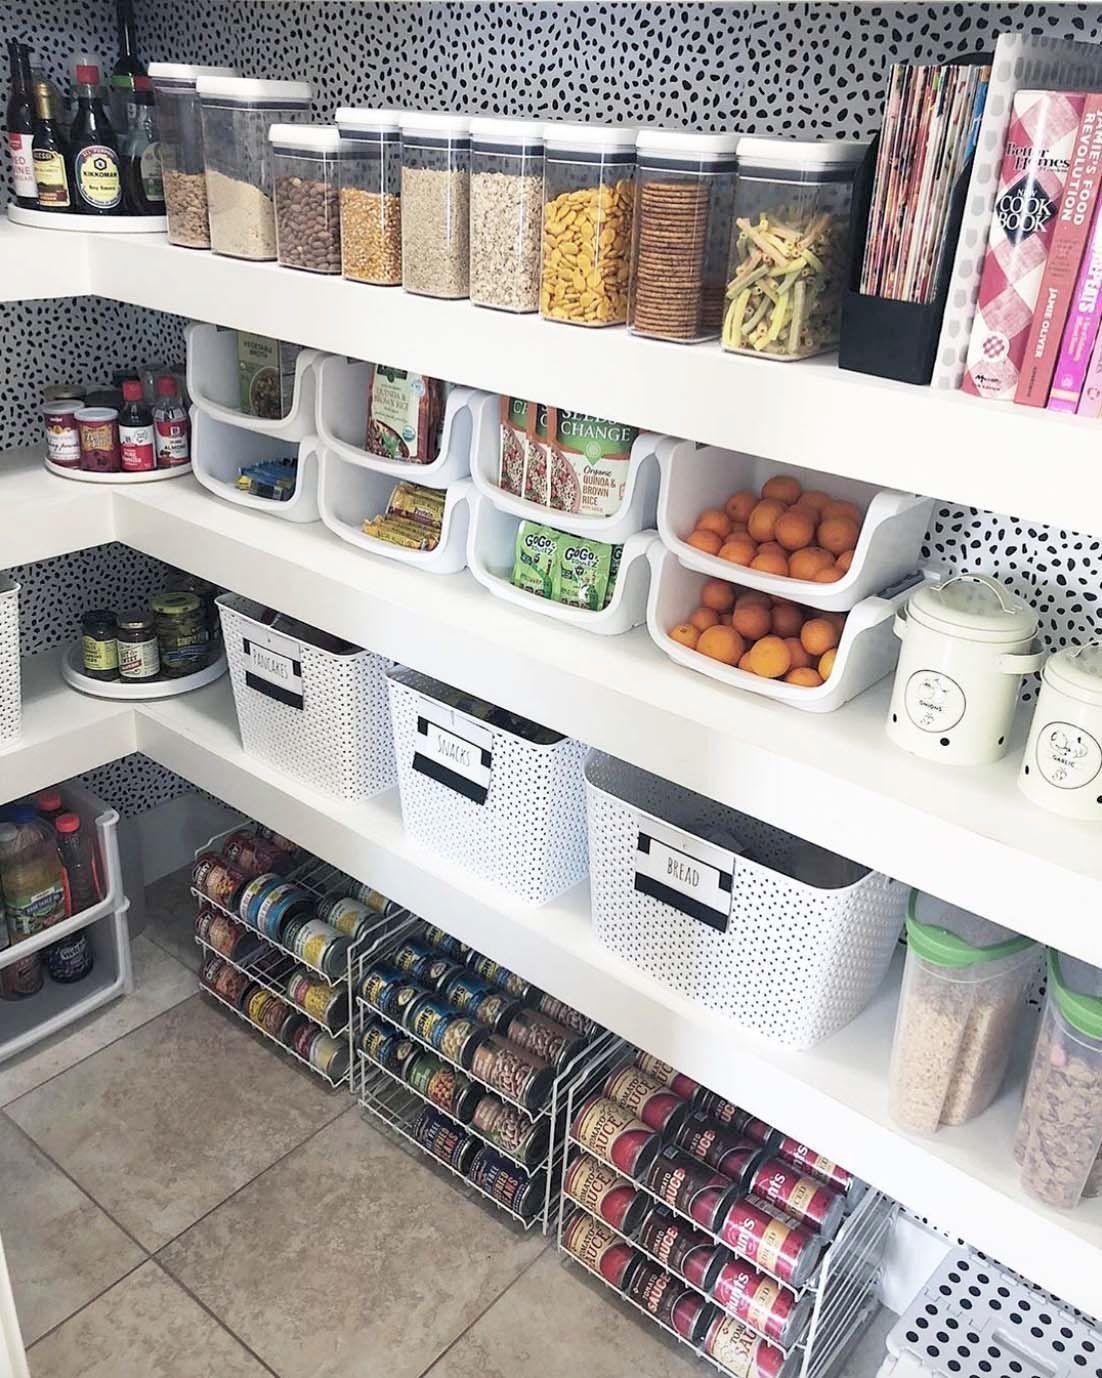 30 Brilliantly Organized Pantry Ideas To Maximize Your Storage Pantry Remodel Pantry Design Kitchen Pantry Design